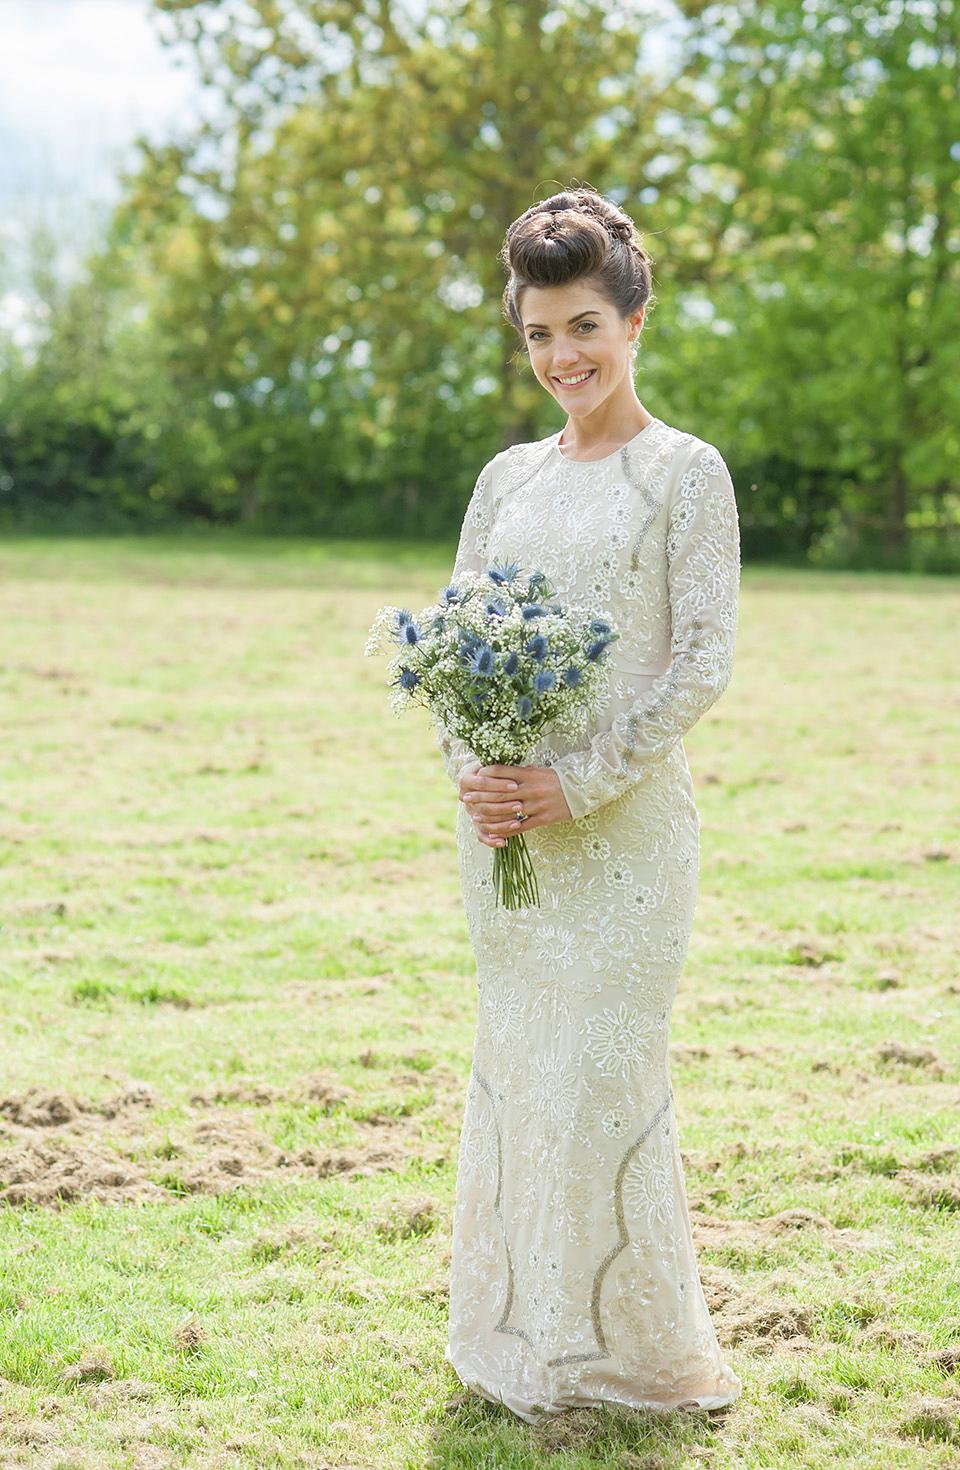 A Needle and Thread Dress for a Modern and Elegant Dewsall Court Wedding (Weddings )